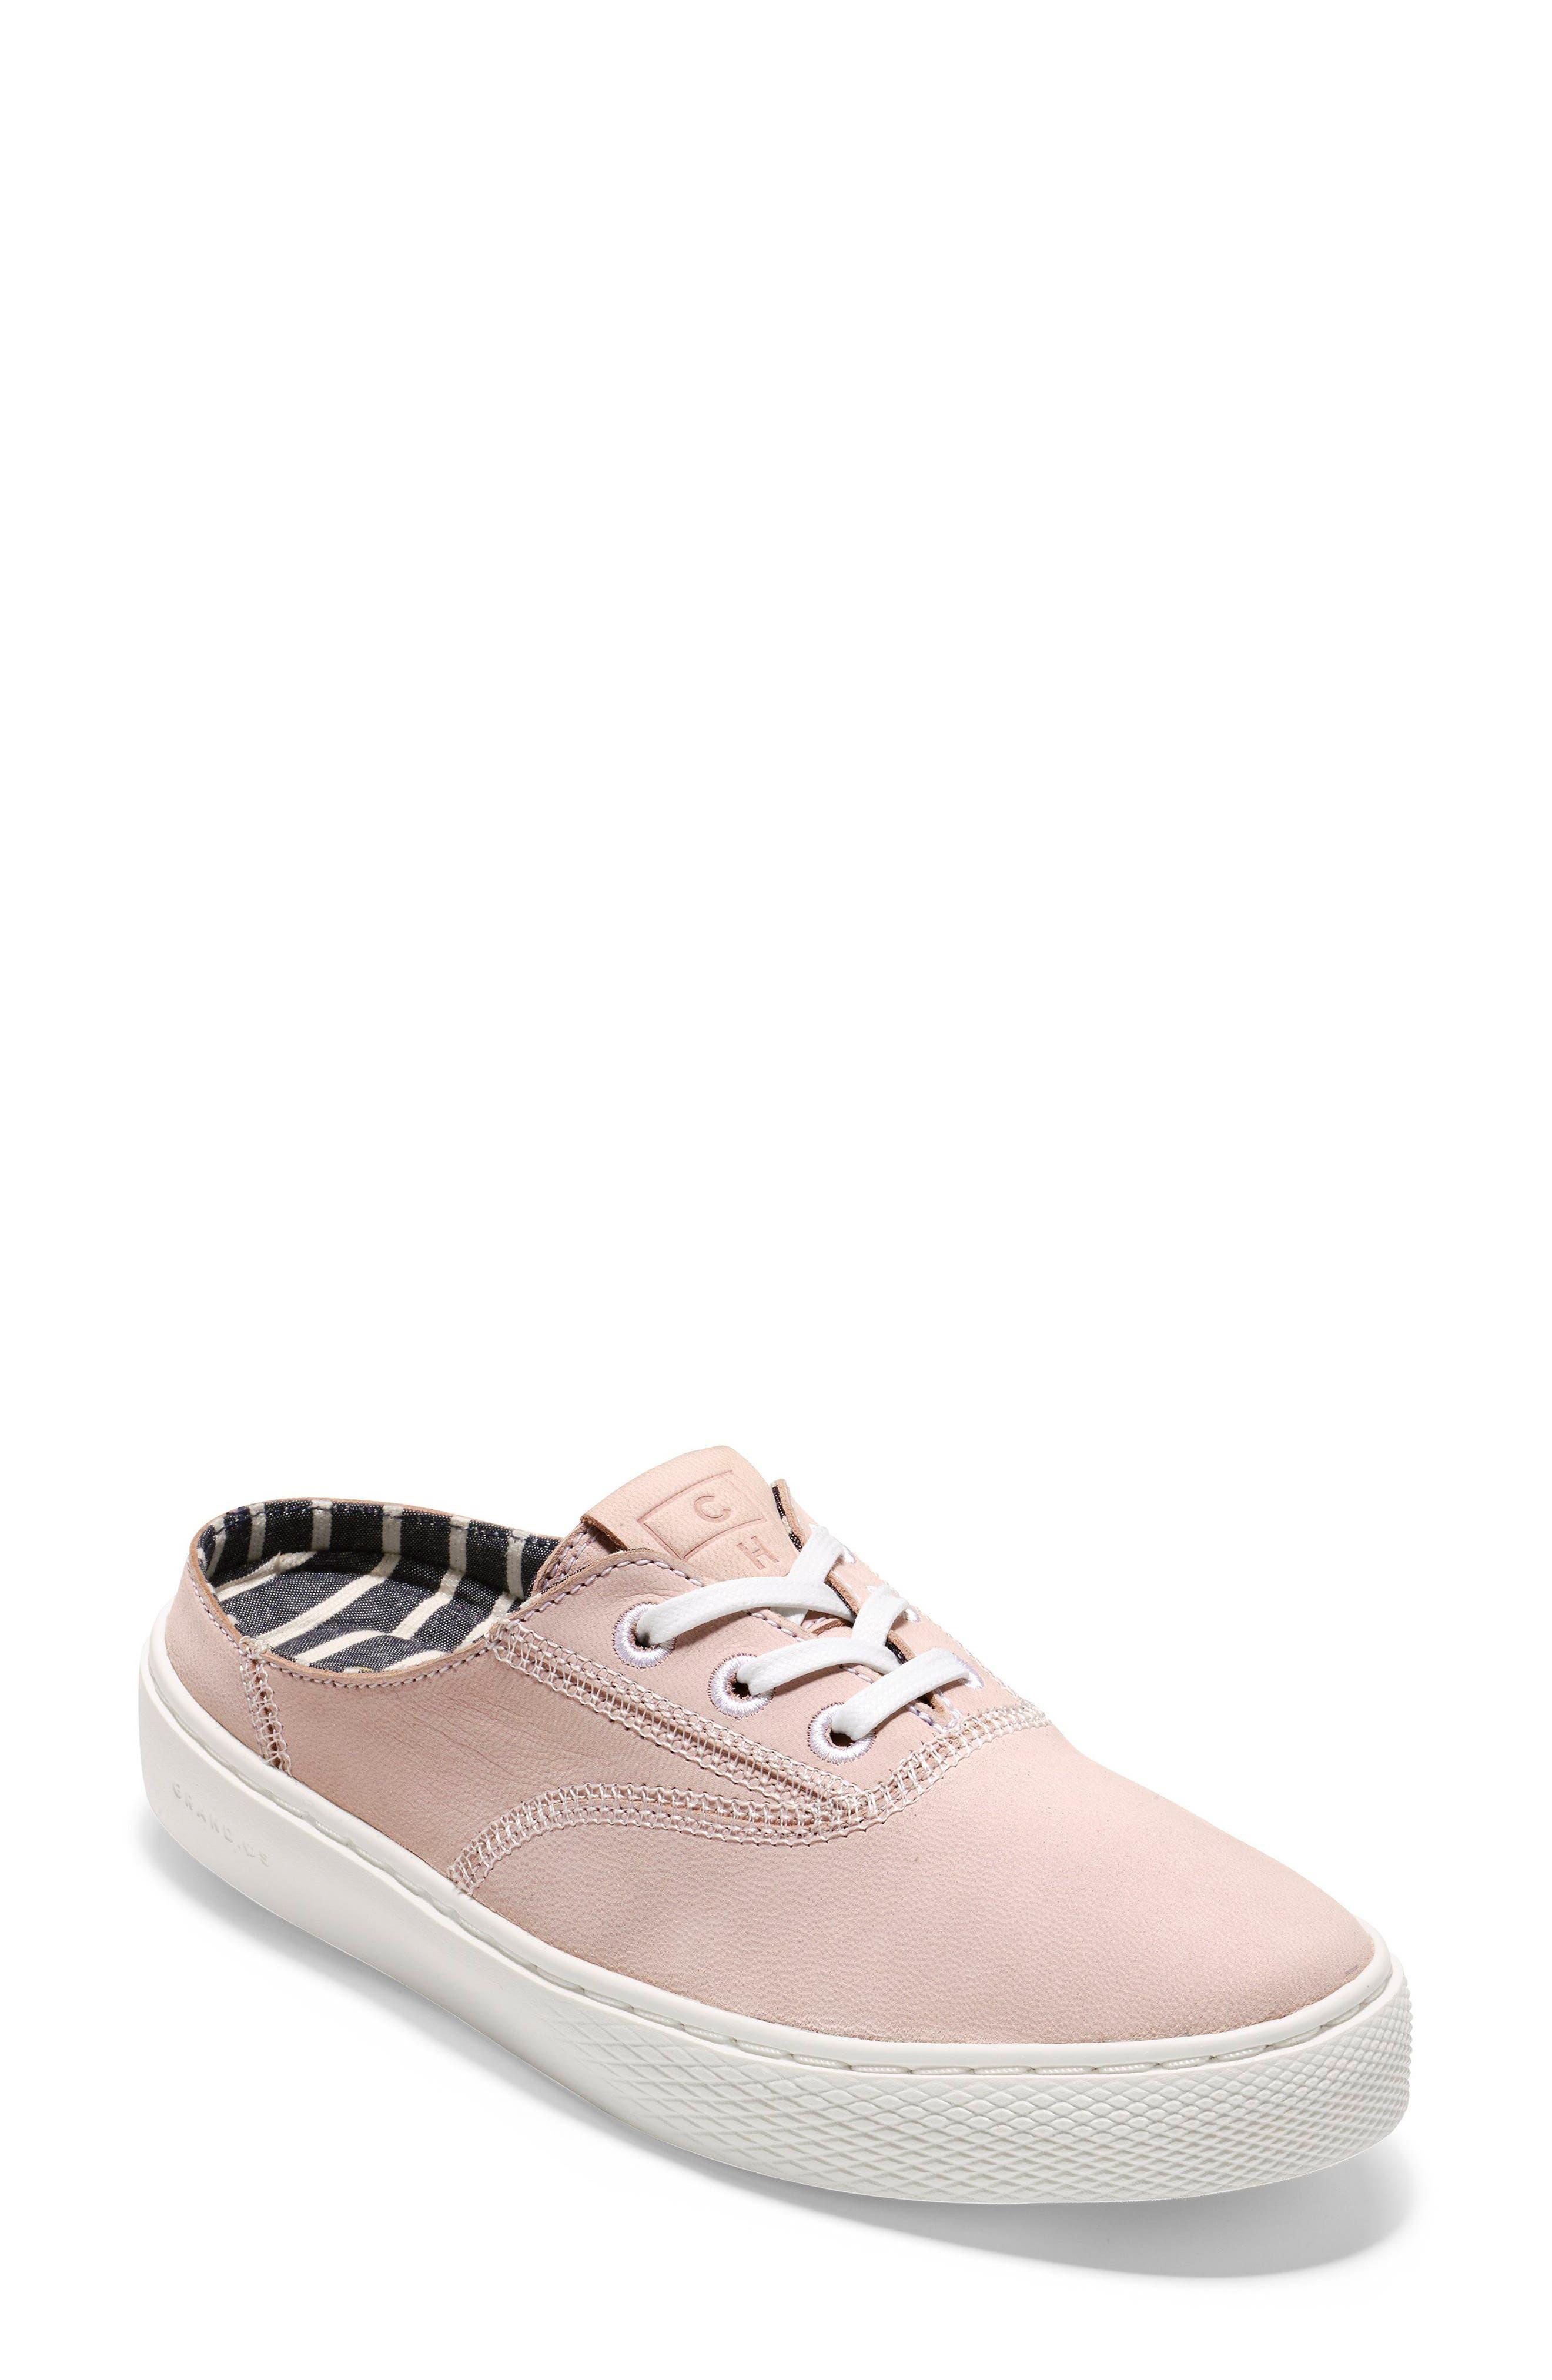 GrandPro Deck Sneaker,                         Main,                         color, PETAL/ OPTIC WHITE NUBUCK